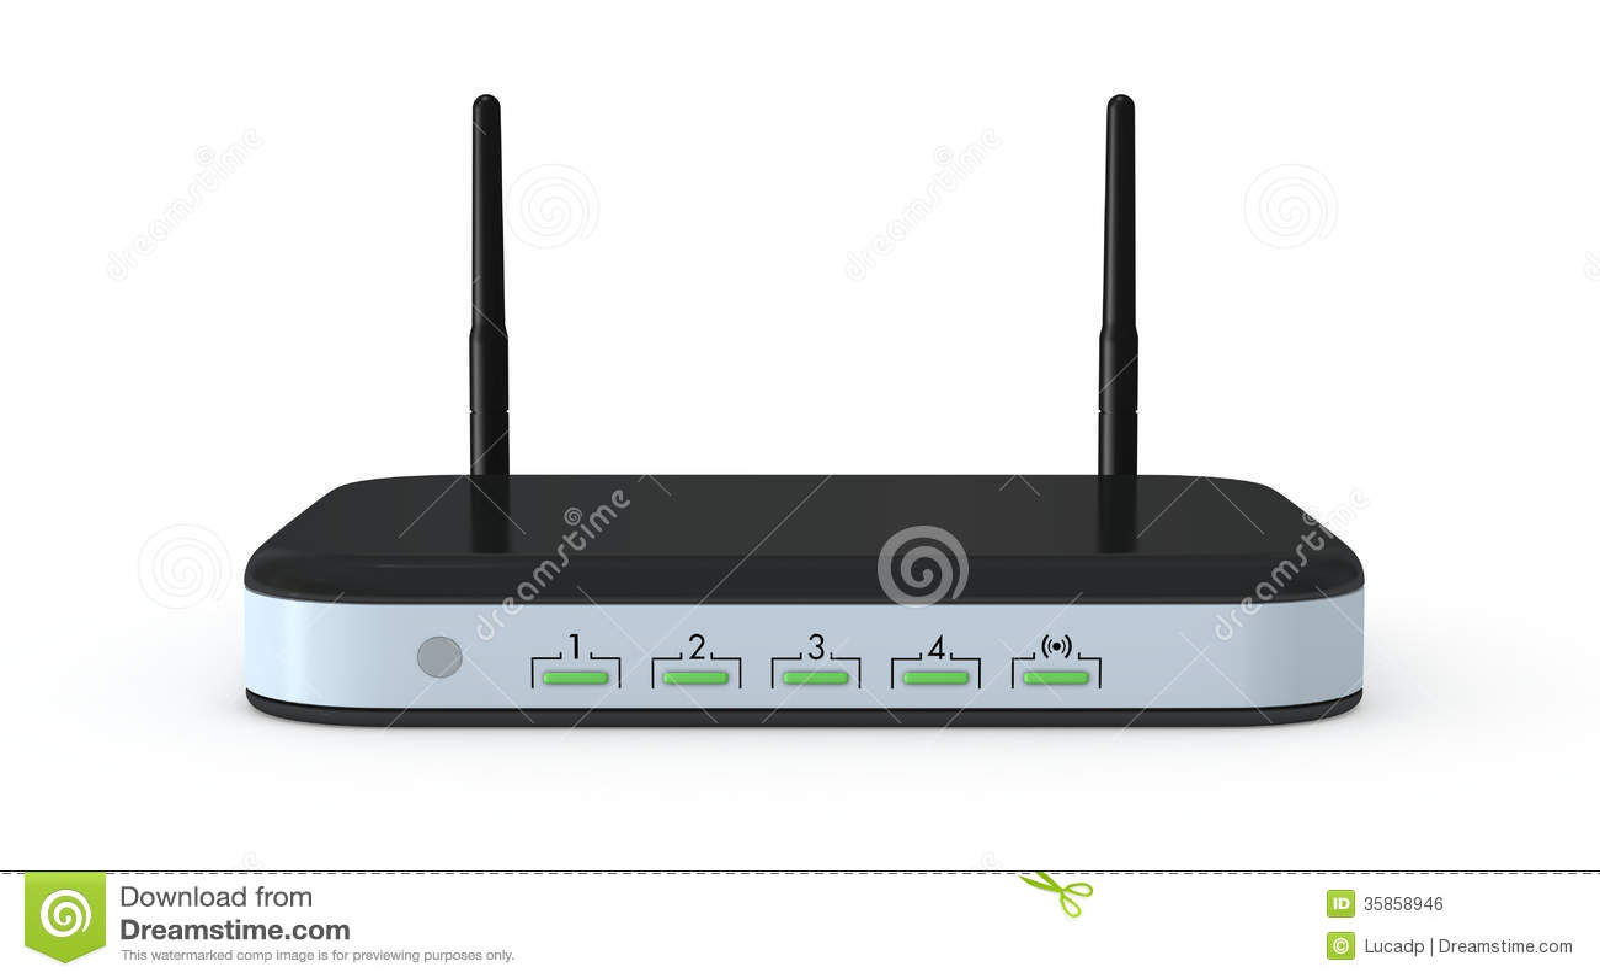 linksys wireless router setup diagram craftsman lawn tractor parts cable modem combo dsl ~ elsavadorla